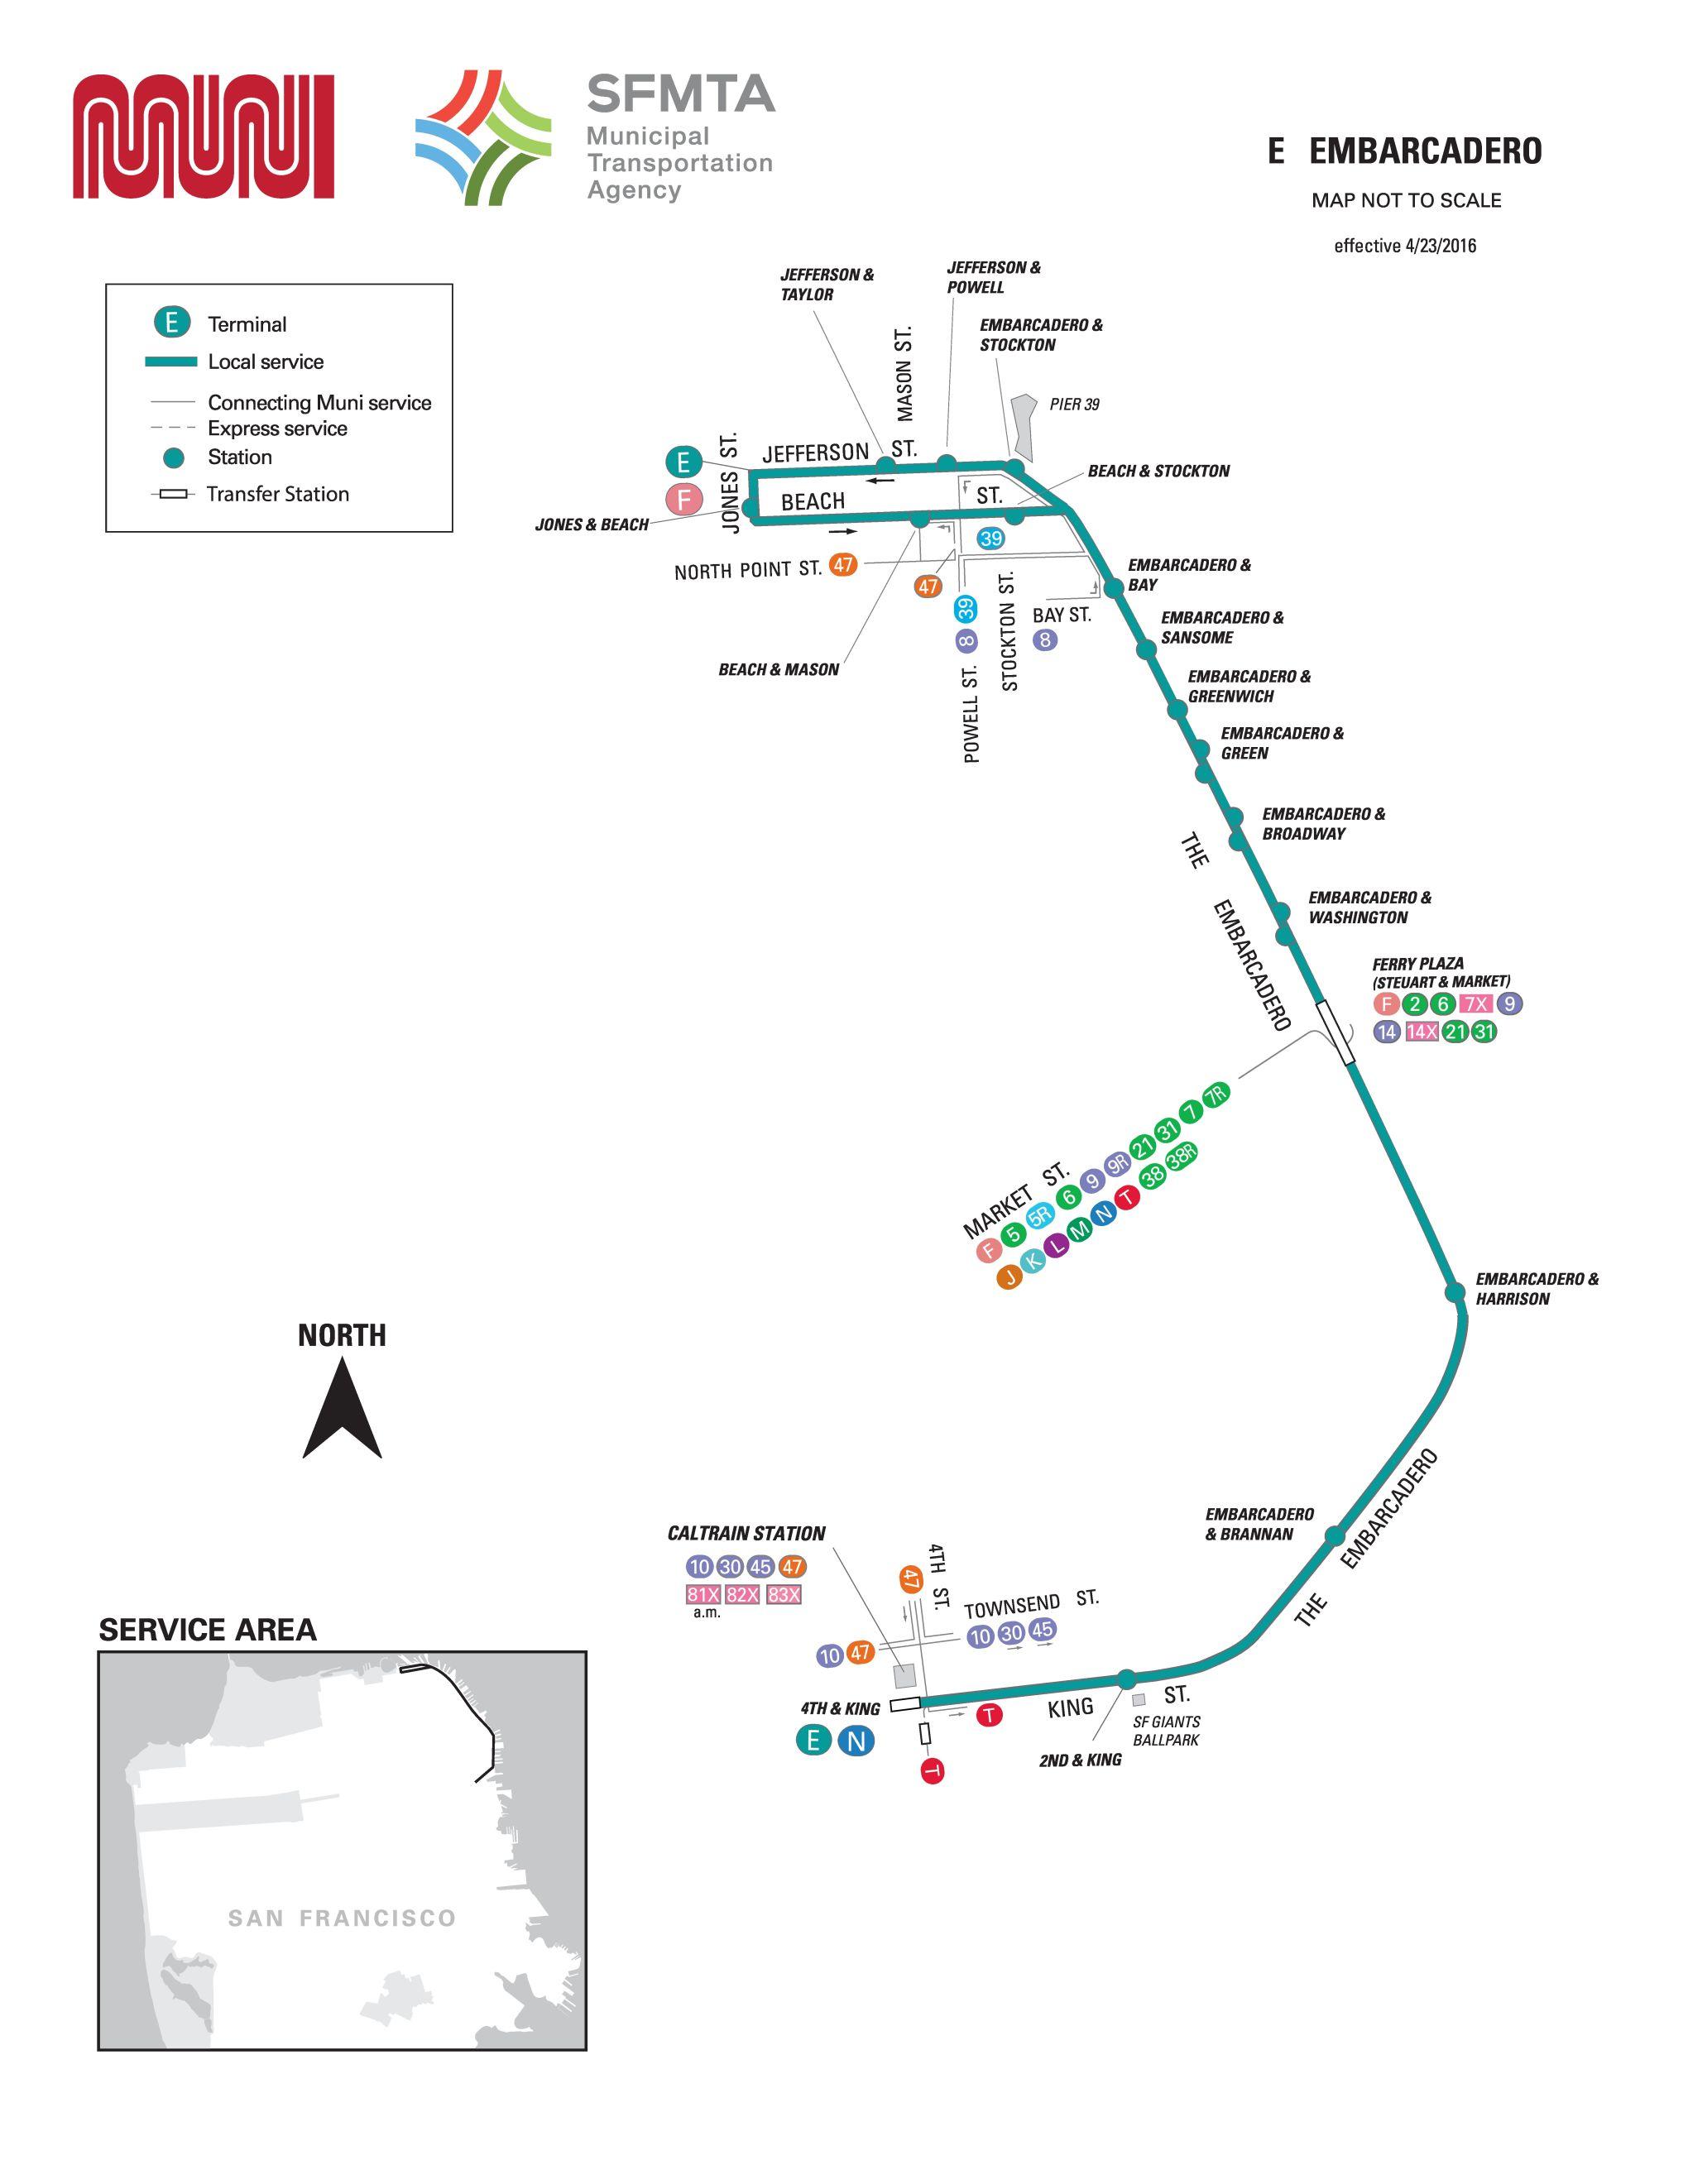 E embarcadero streetcar route sf muni sf bay transit sf muni map publicscrutiny Image collections